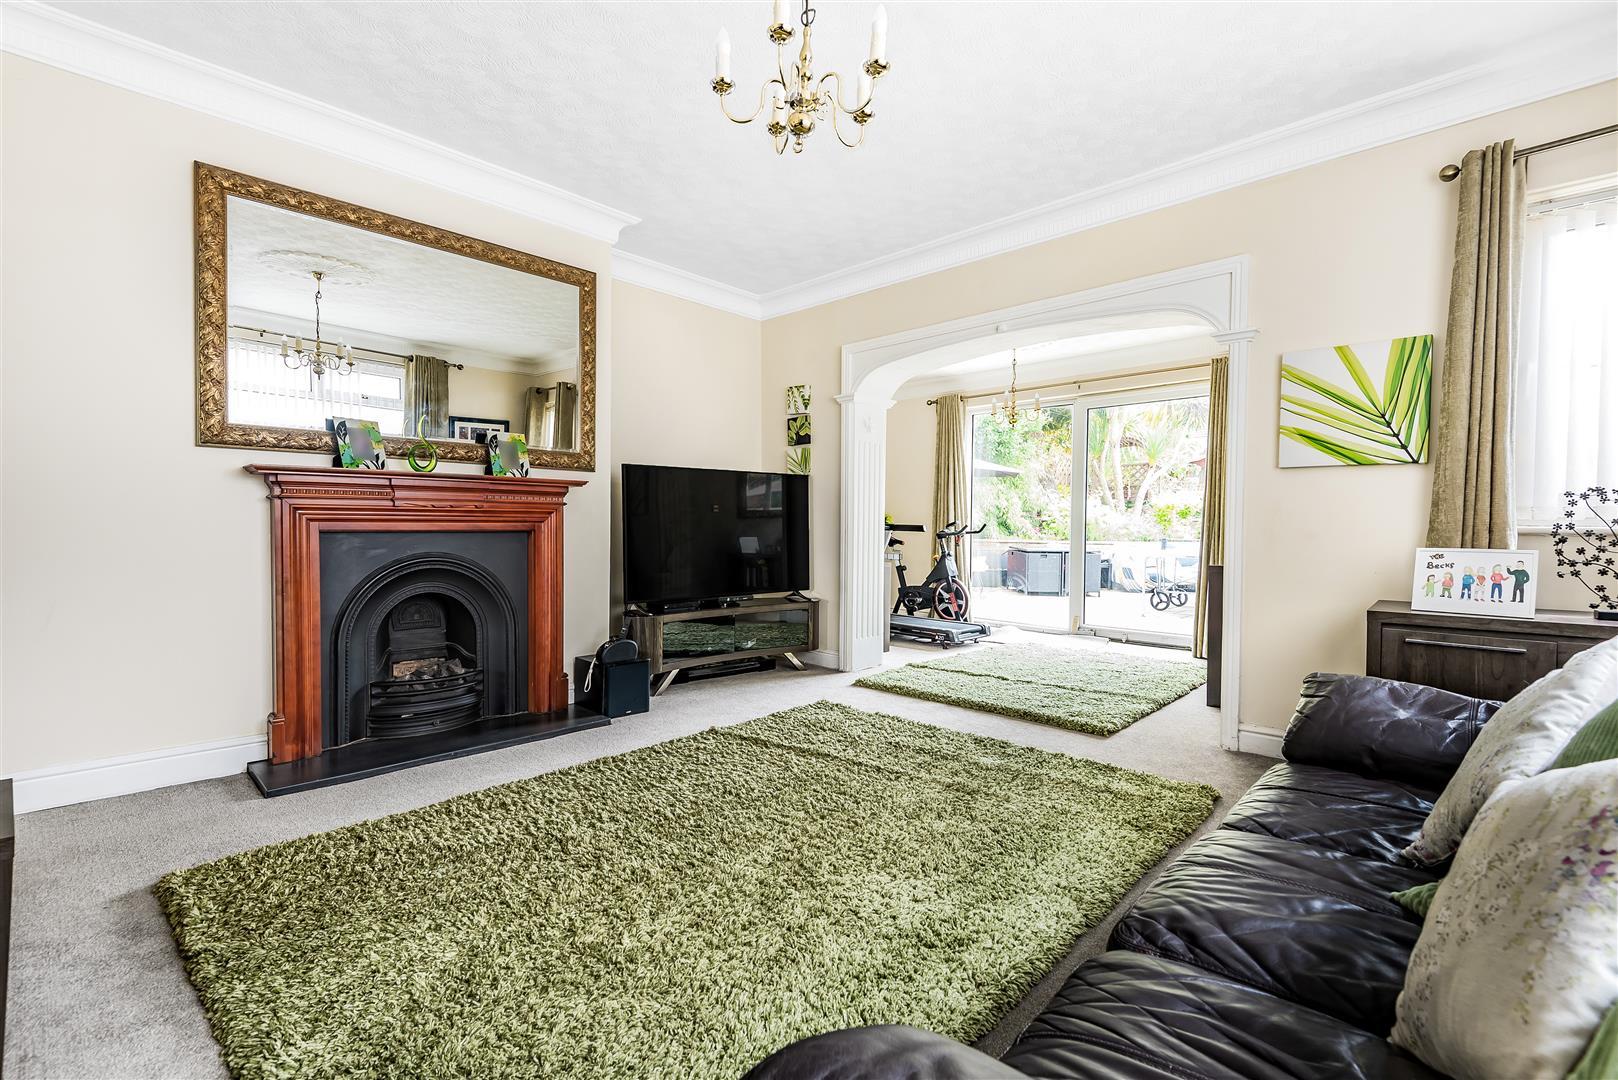 Clasemont Road, Morriston, Swansea, SA6 6BT